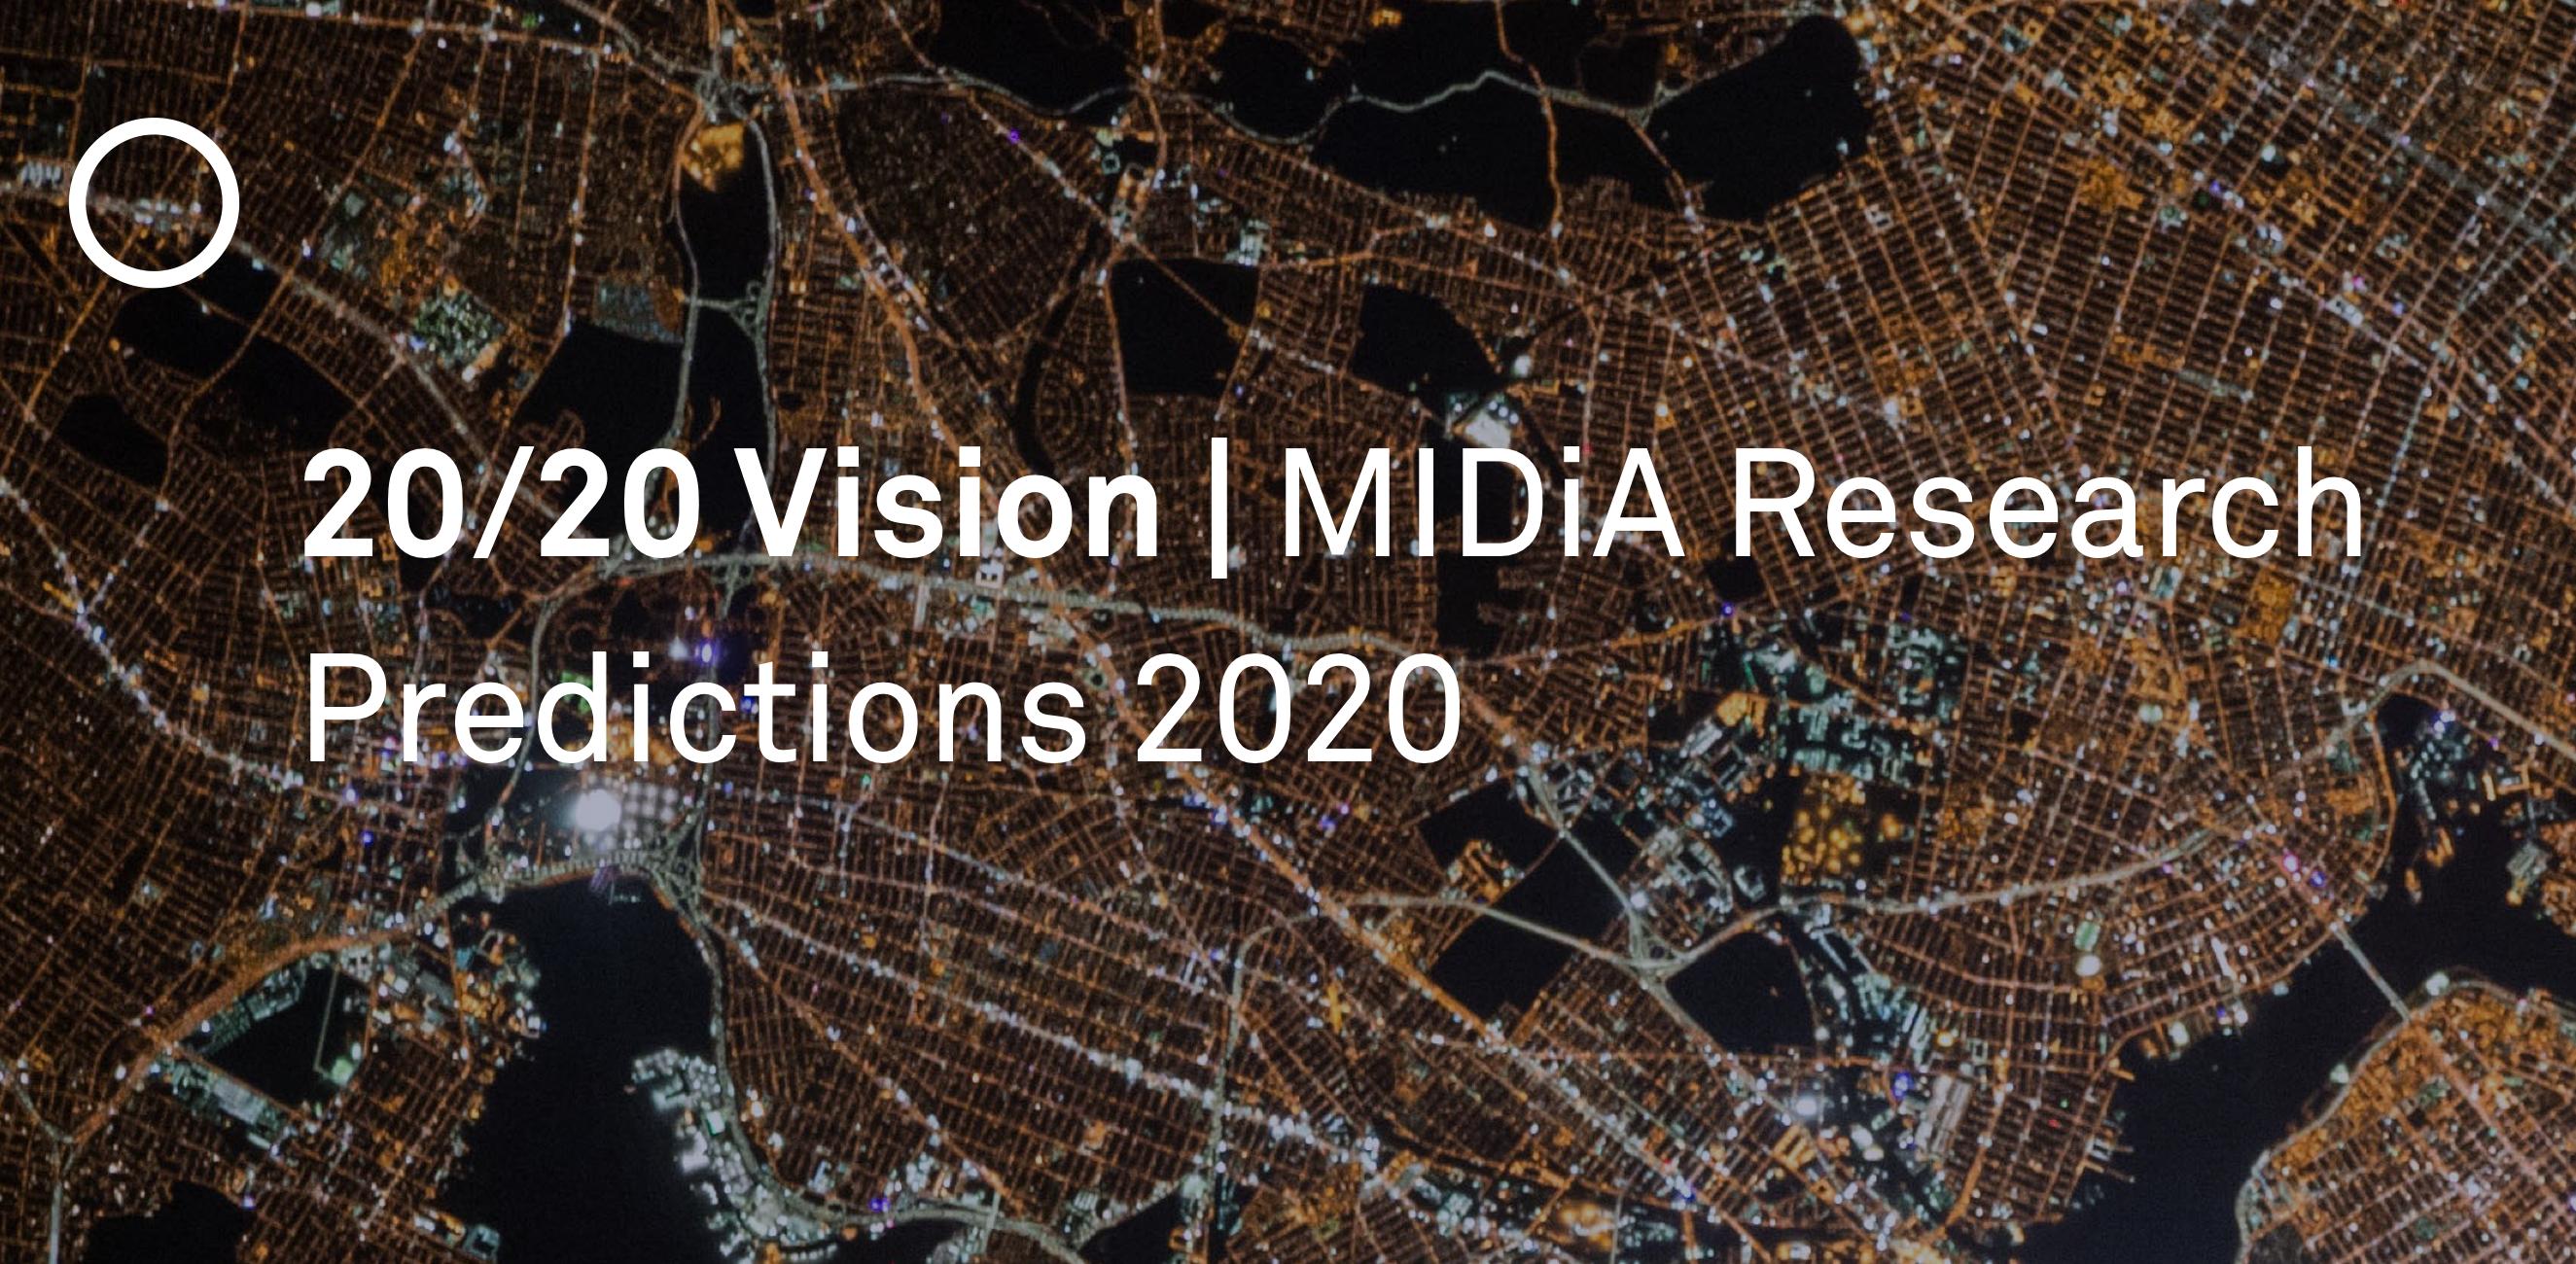 MIDiA Predictions 2020